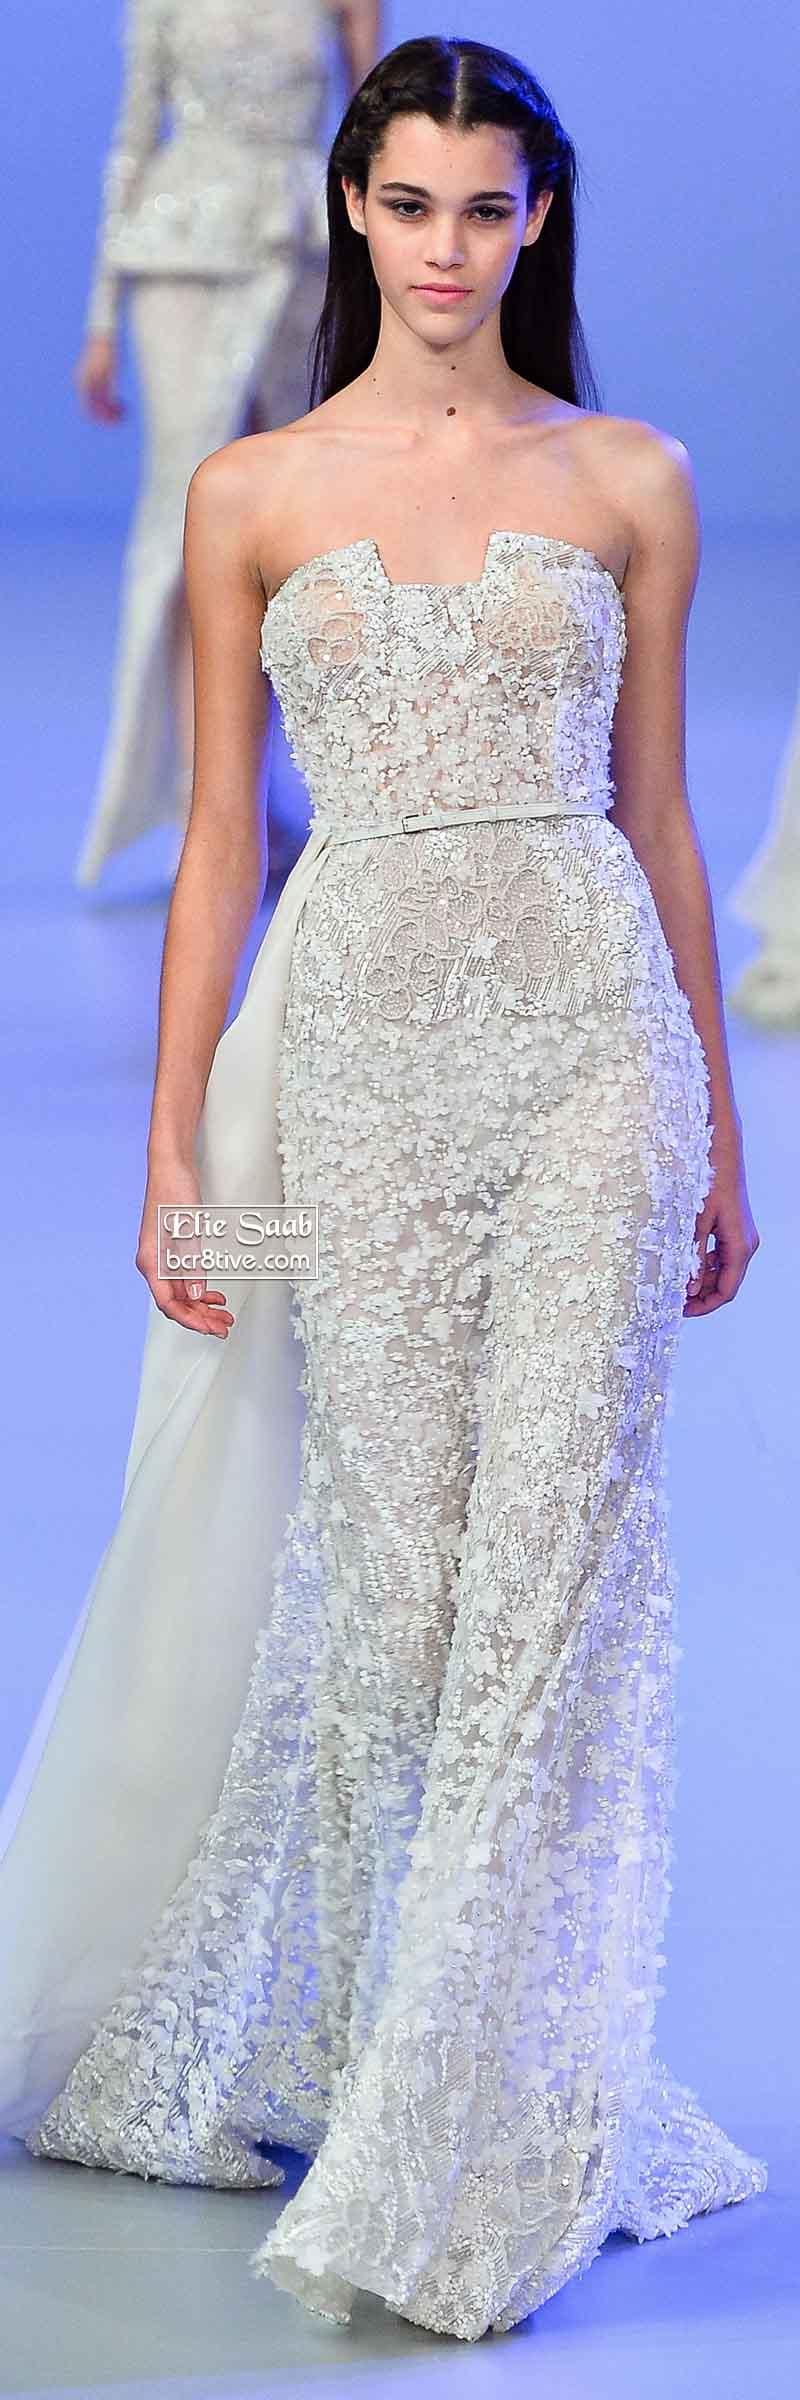 Elie Saab Spring 2014 Couture